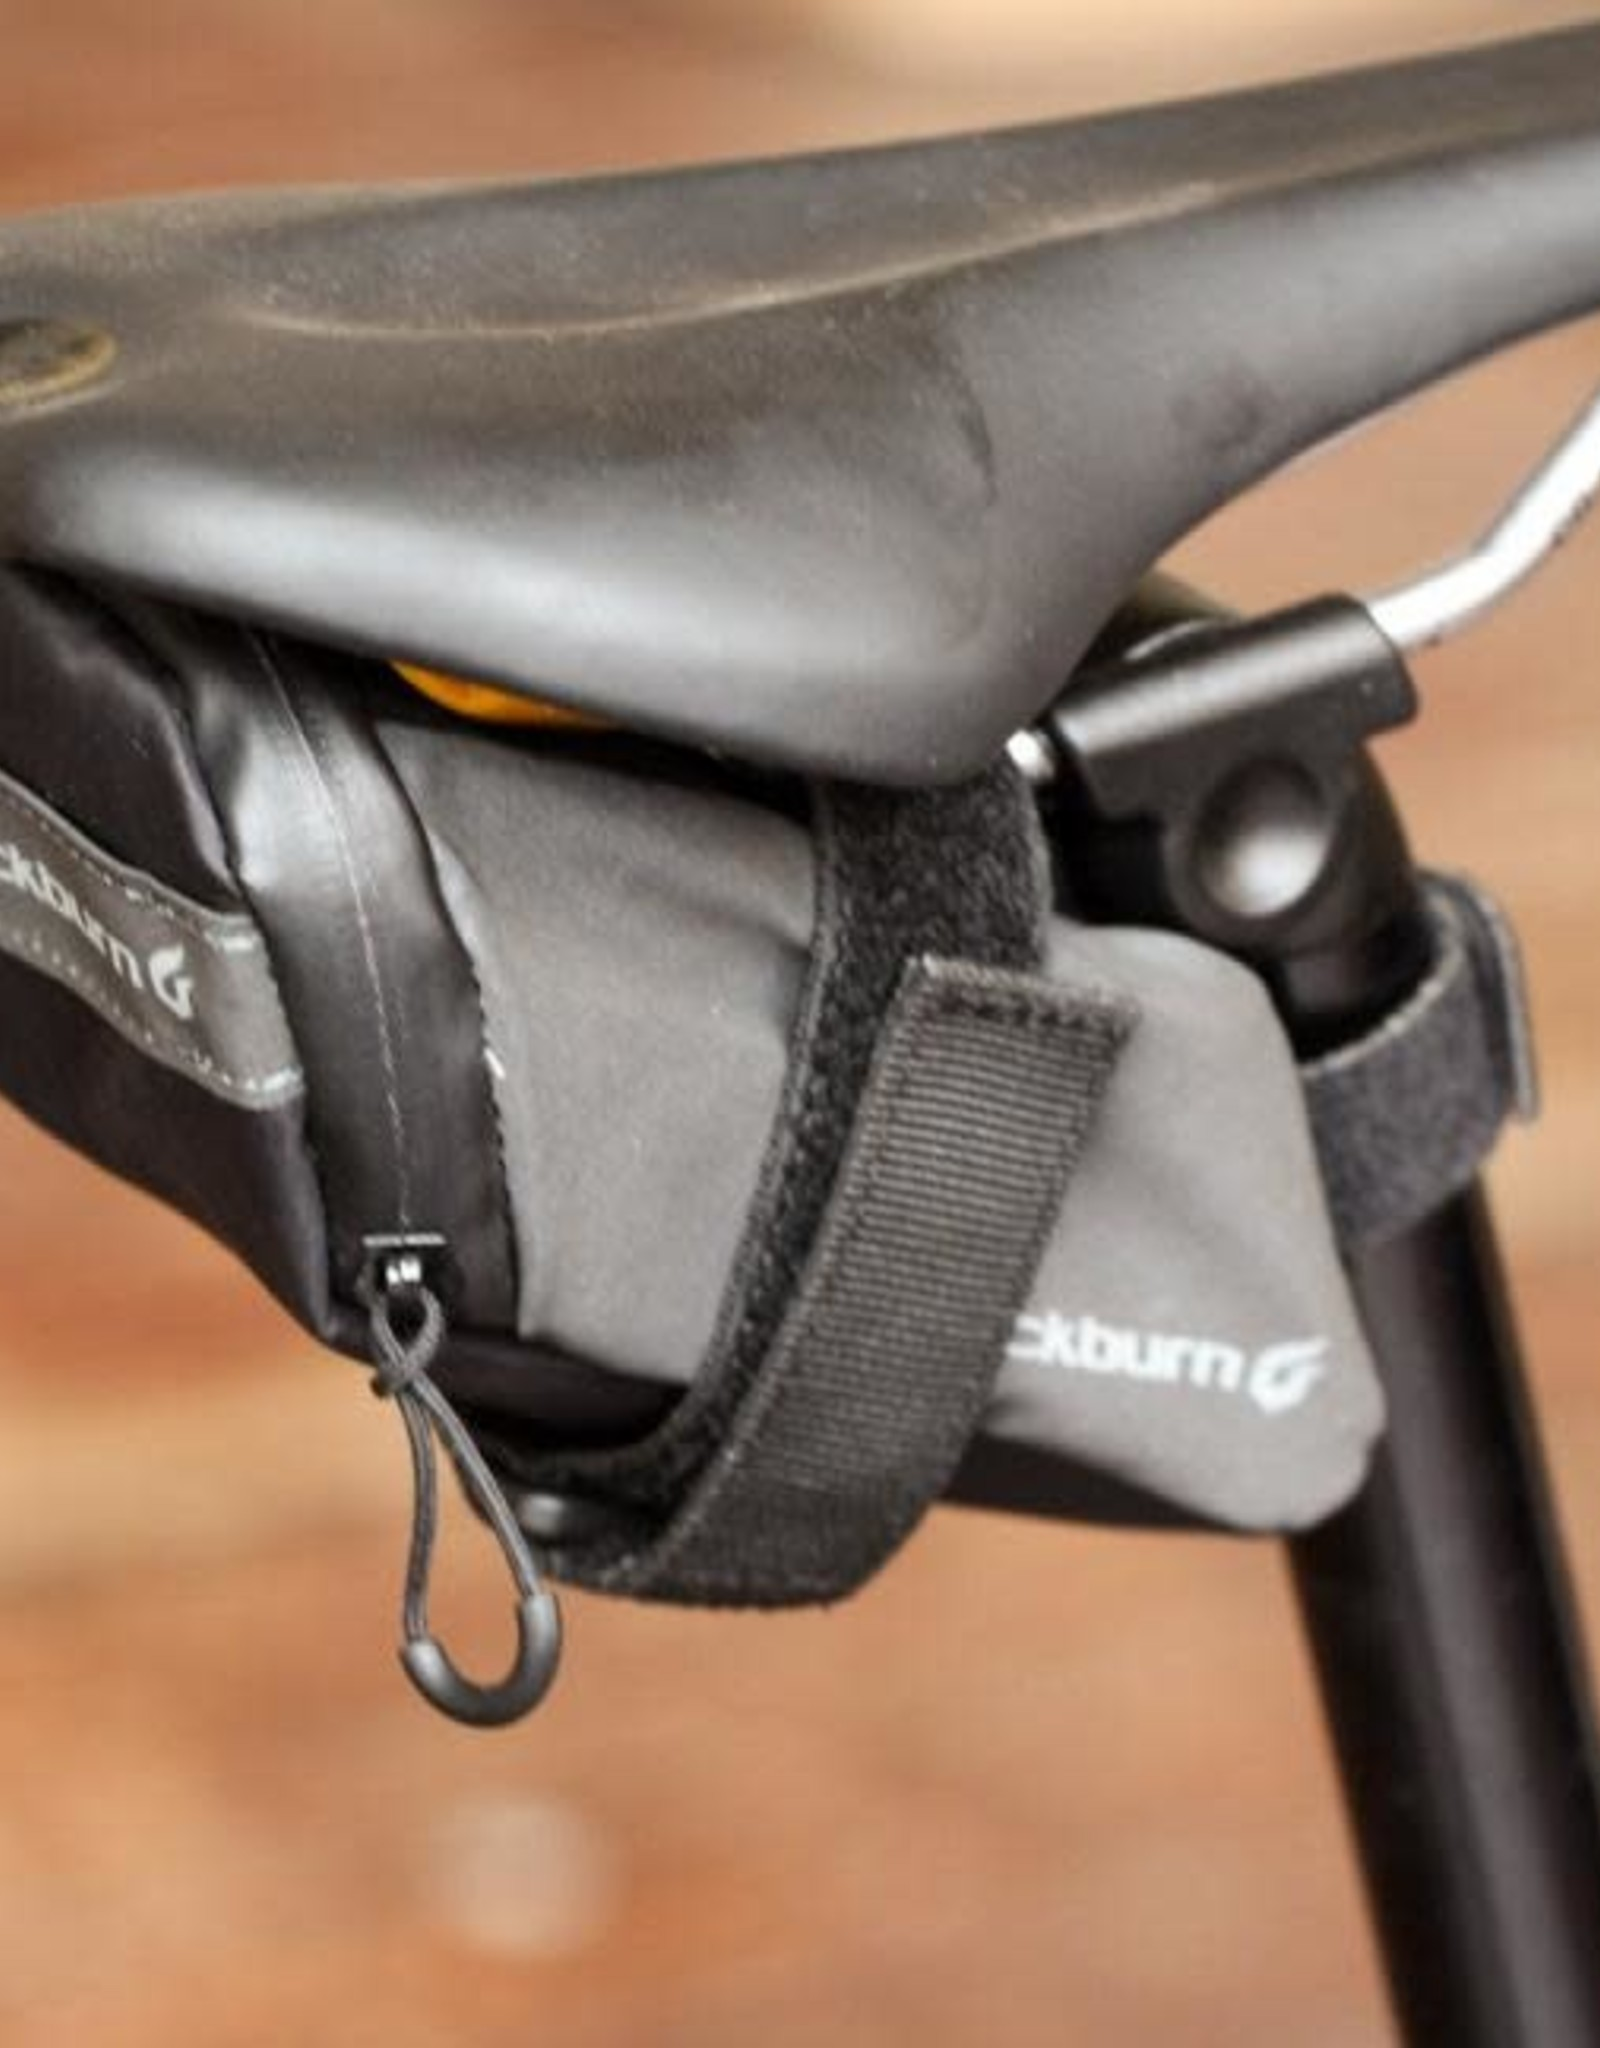 Blackburn BLACKBURN Seat/Saddle Bag GRID - Small